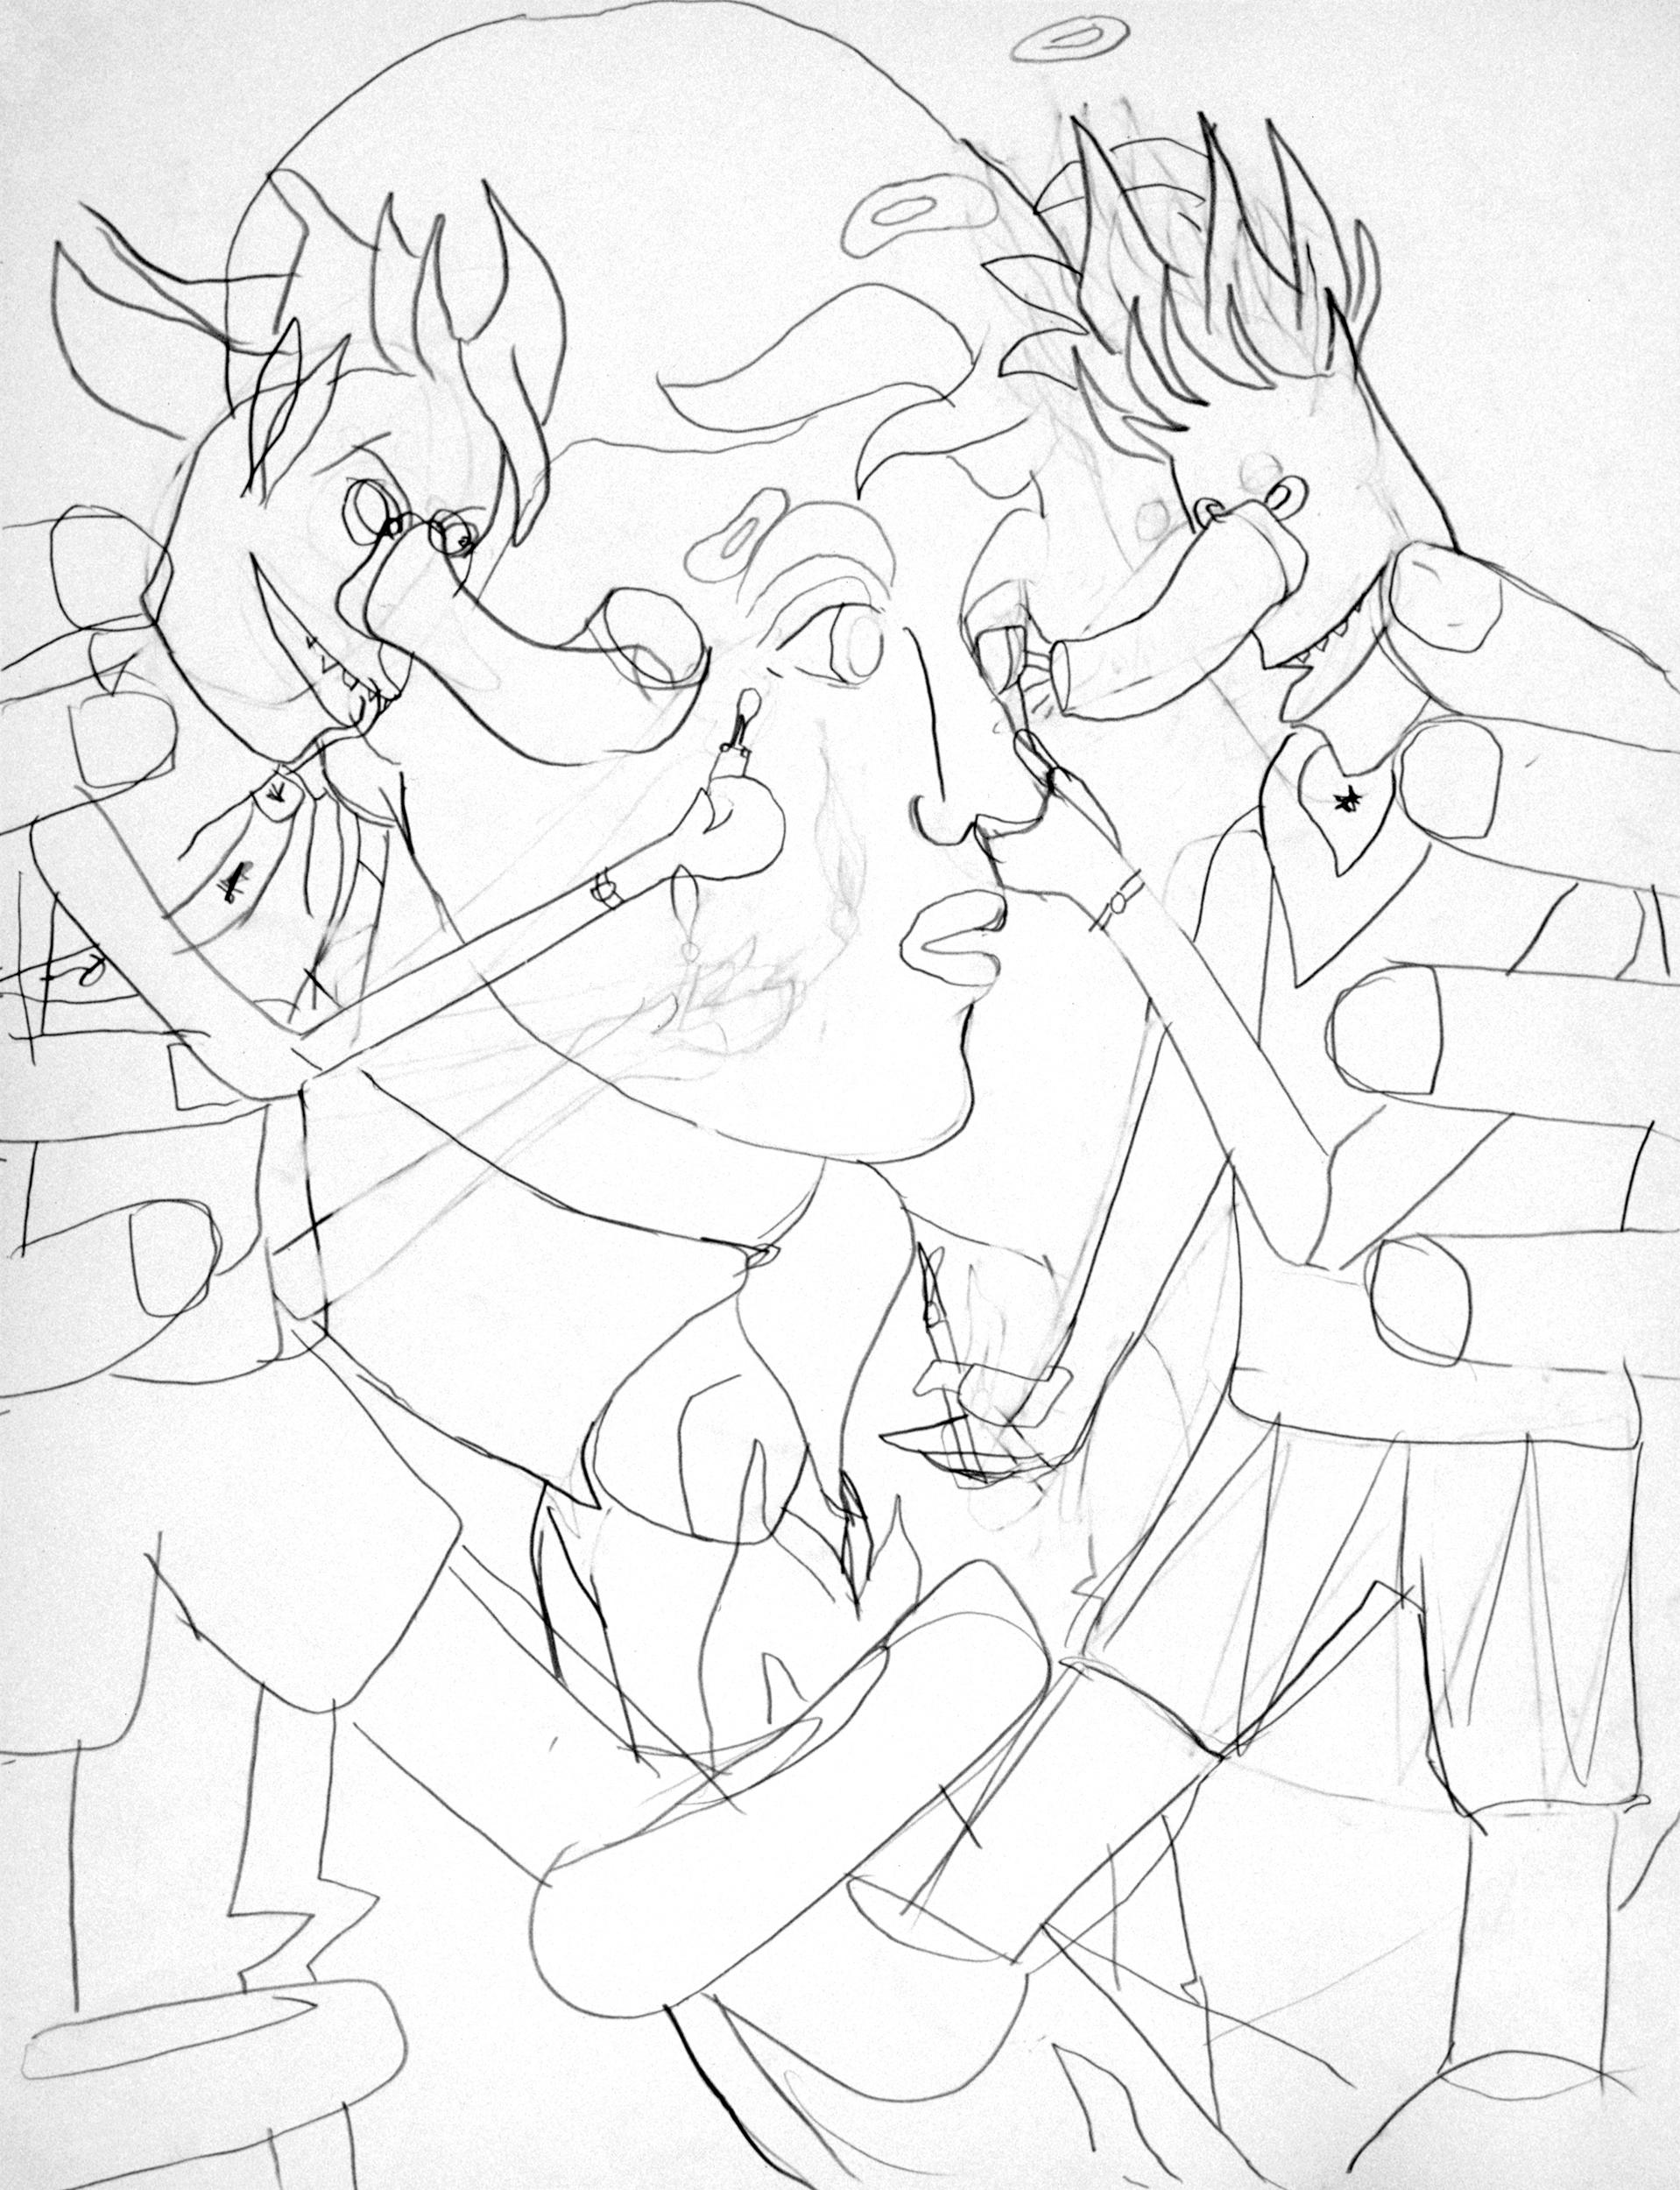 Mocking (wild), drawing by Wouter van Riessen